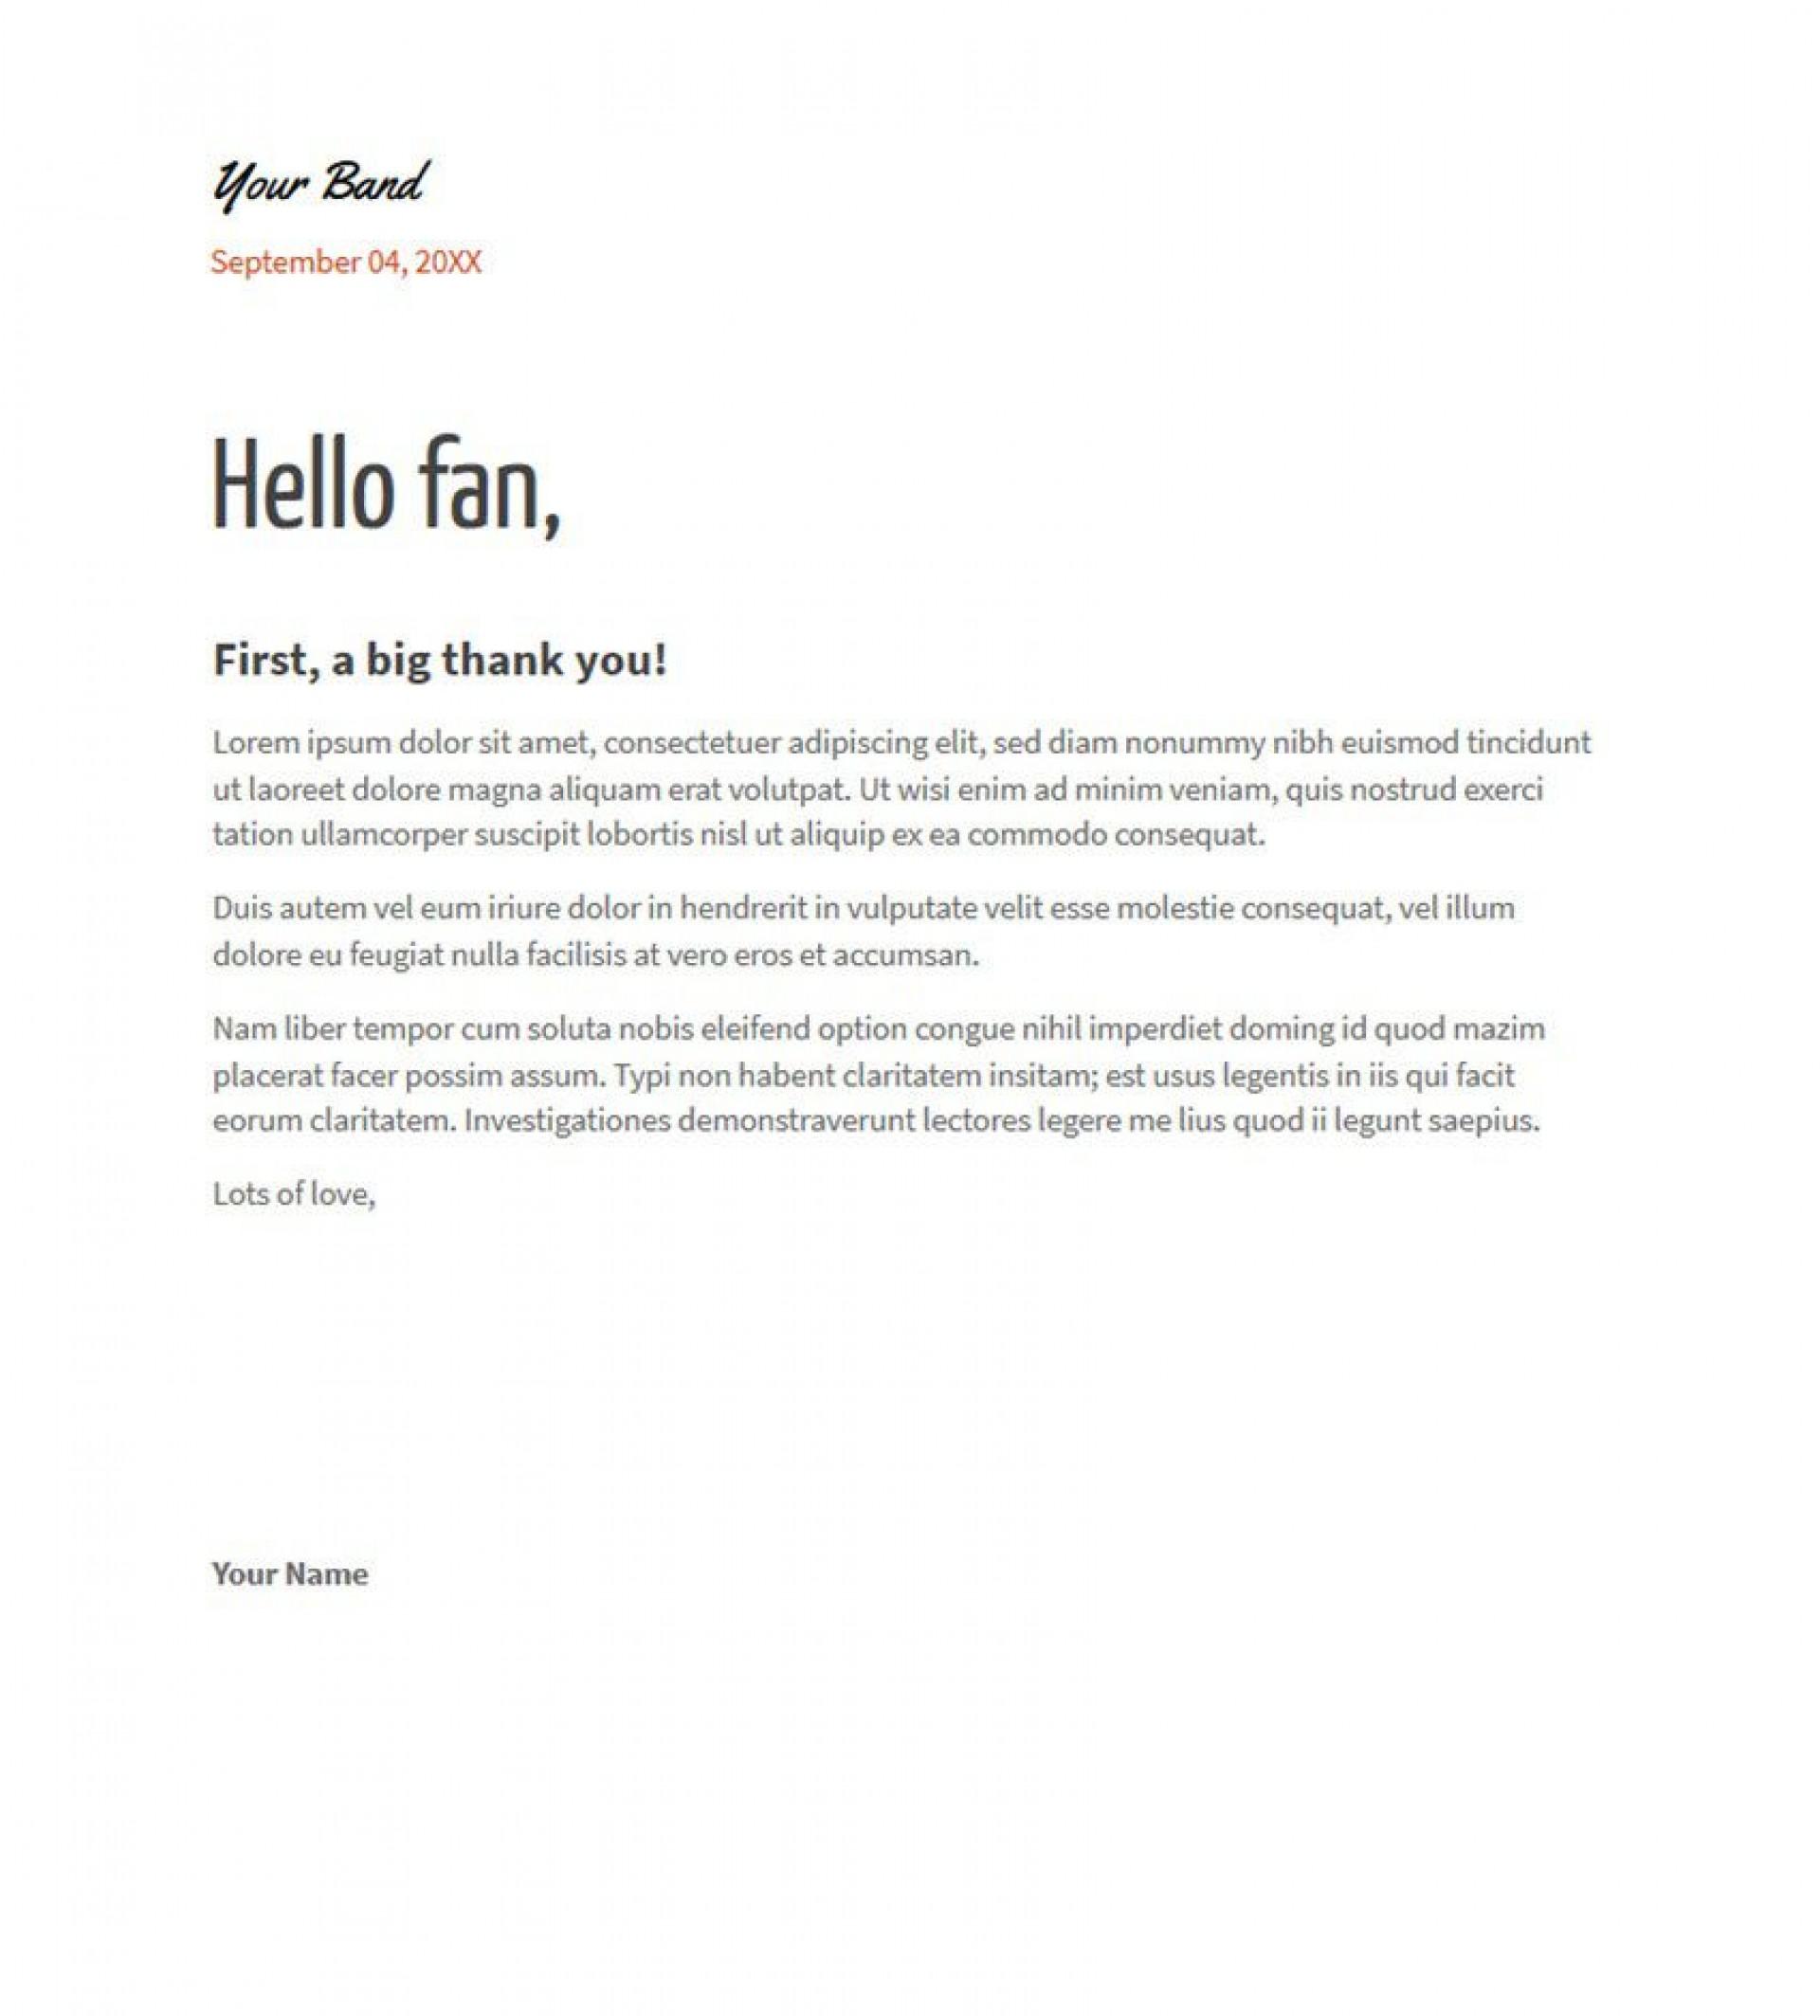 007 Exceptional Newspaper Article Template Google Doc Concept  Docs Format1920